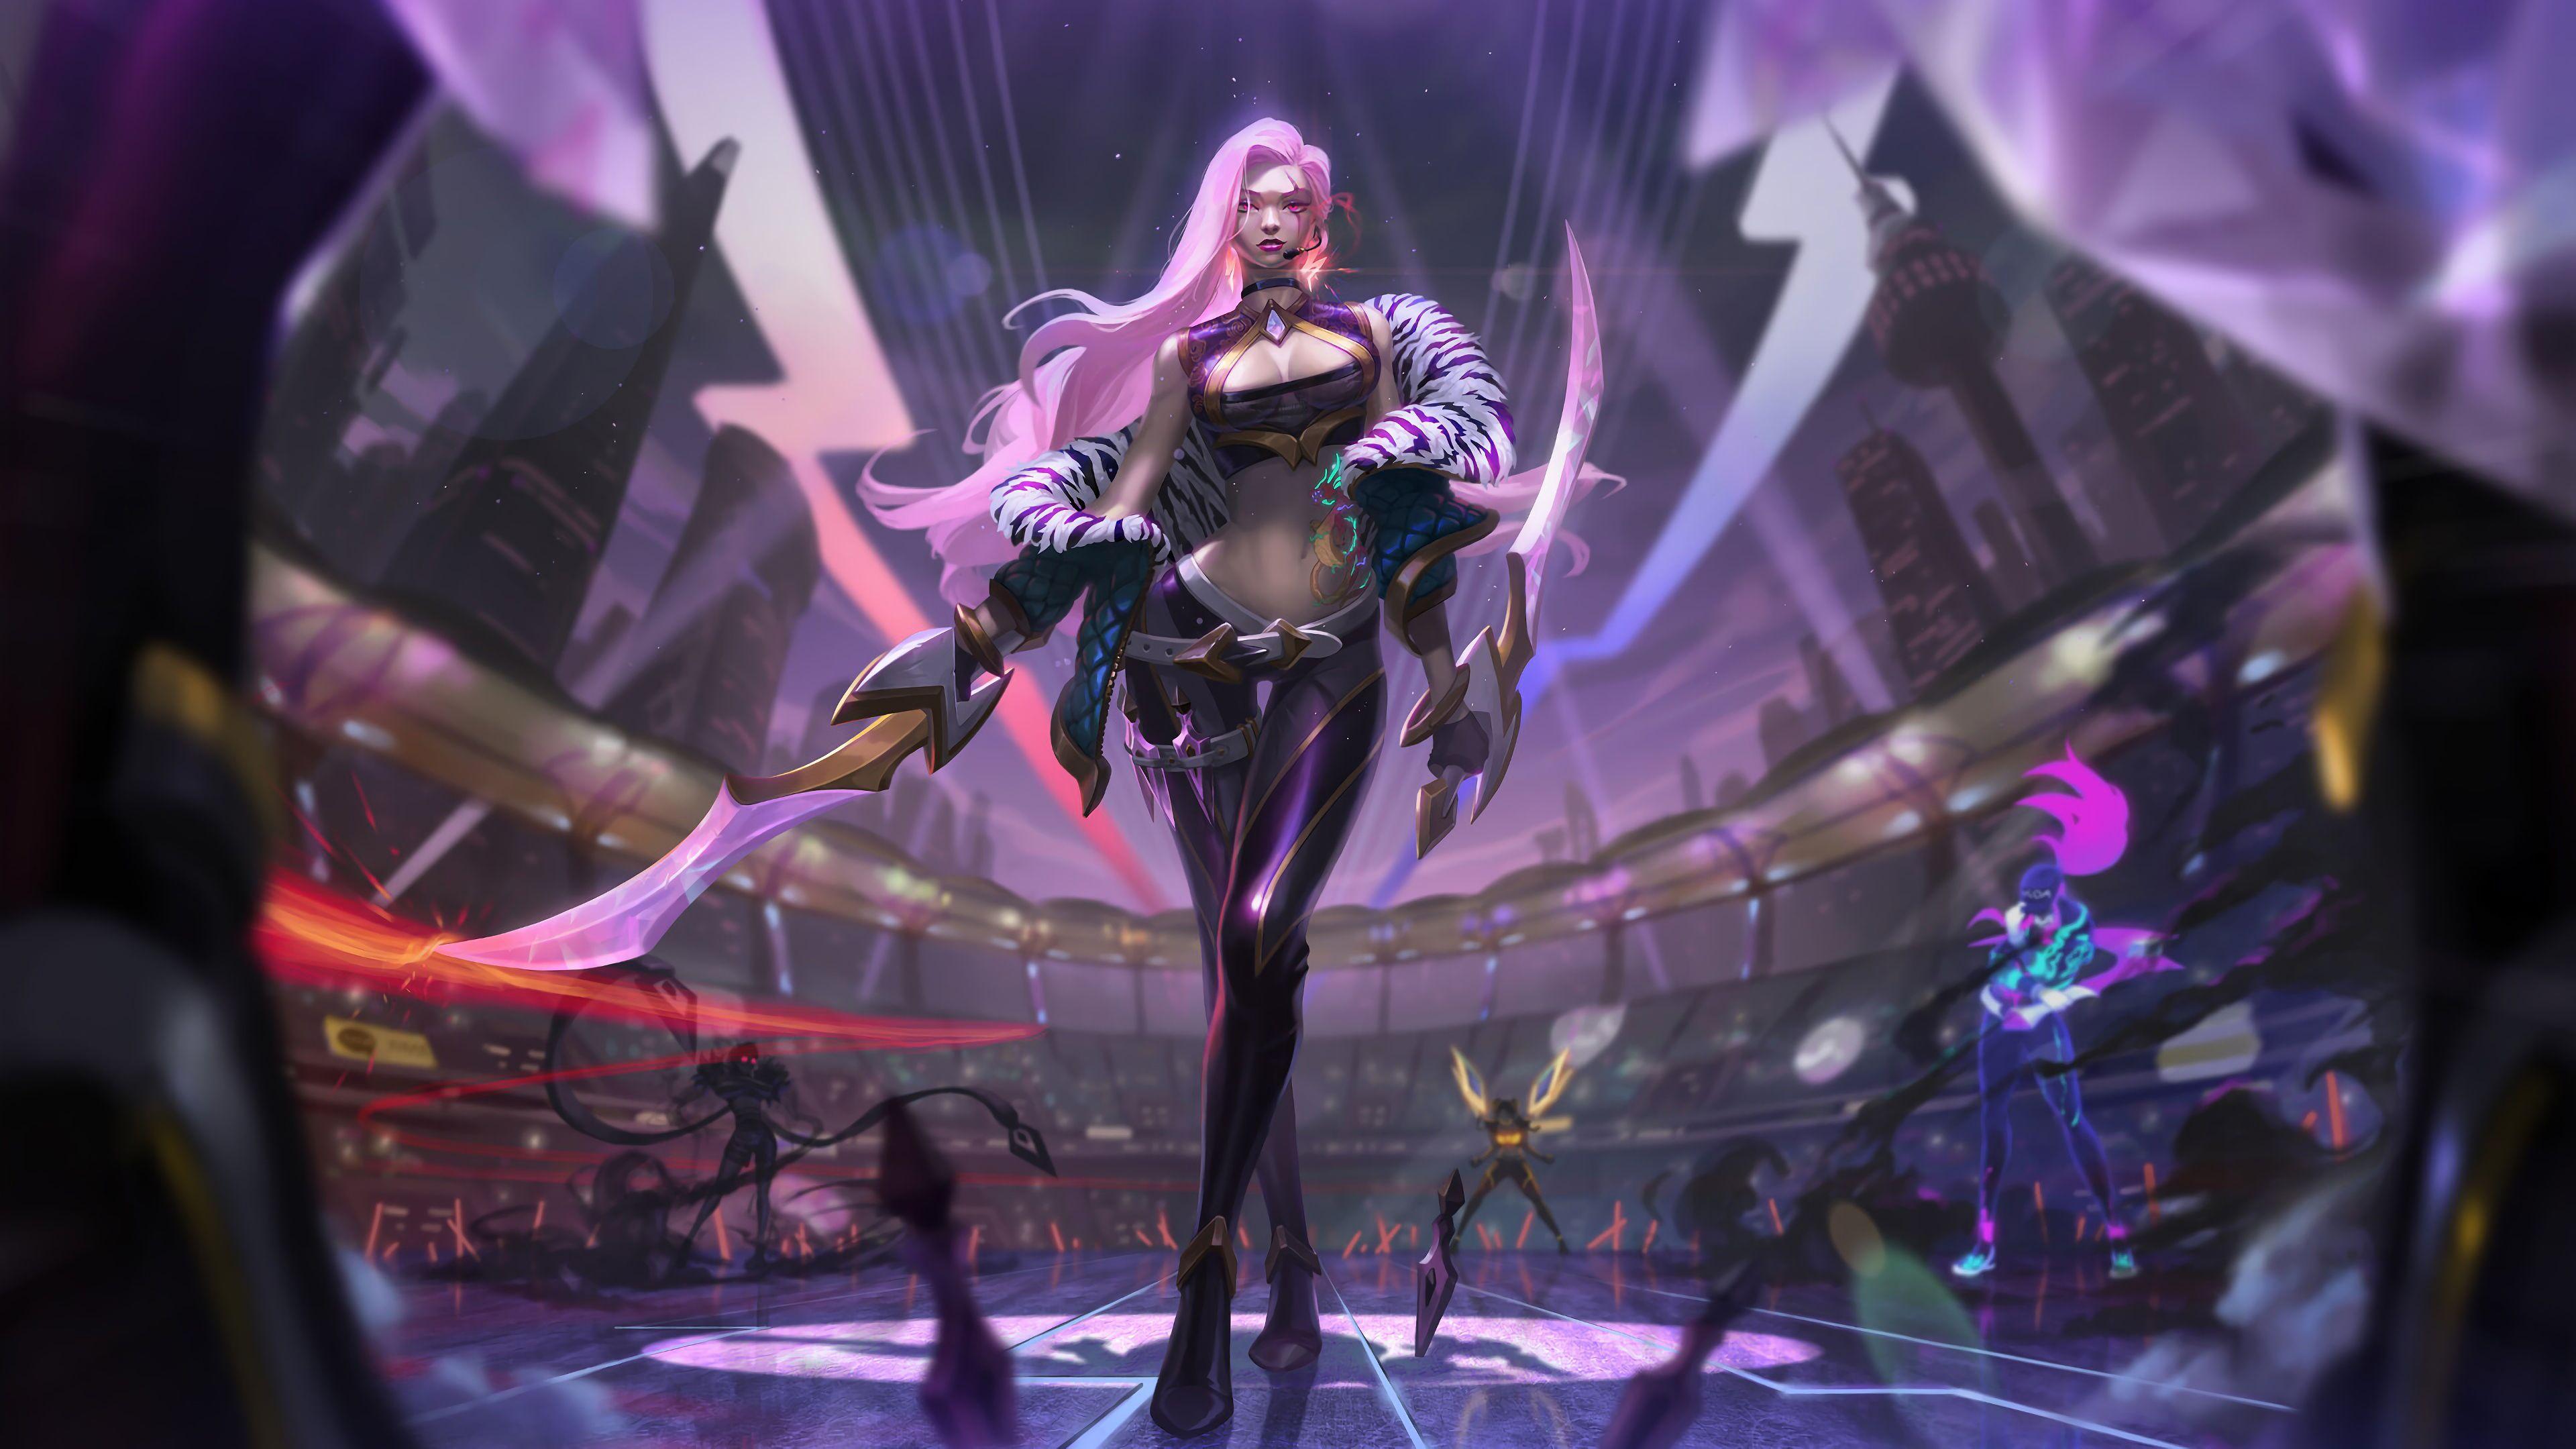 Kda Katarina League Of Legends 4k League Of Legends Wallpapers Katarina League Of Legends Wallpapers League Of Legends League Of Legends Support Fantasy Girl